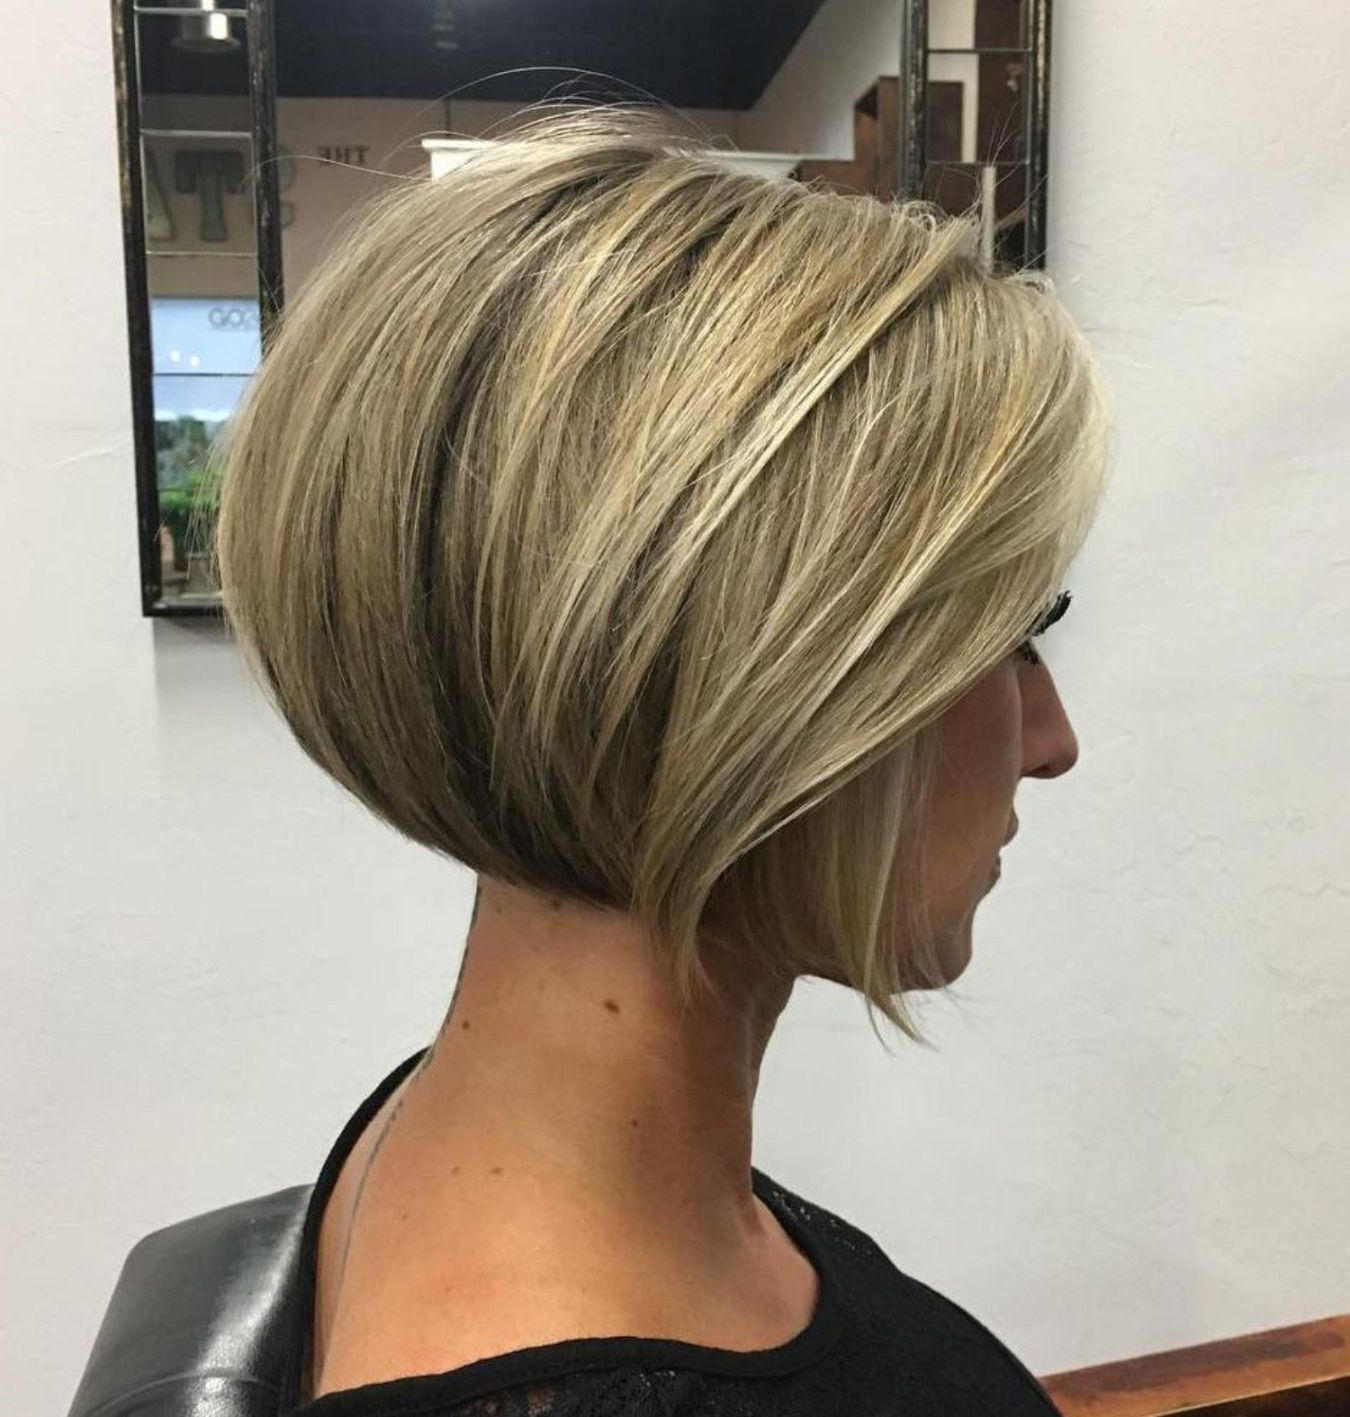 100 Mind Blowing Short Hairstyles For Fine Hair Kapsels Kort Carre Kapsel En Kapselideeen